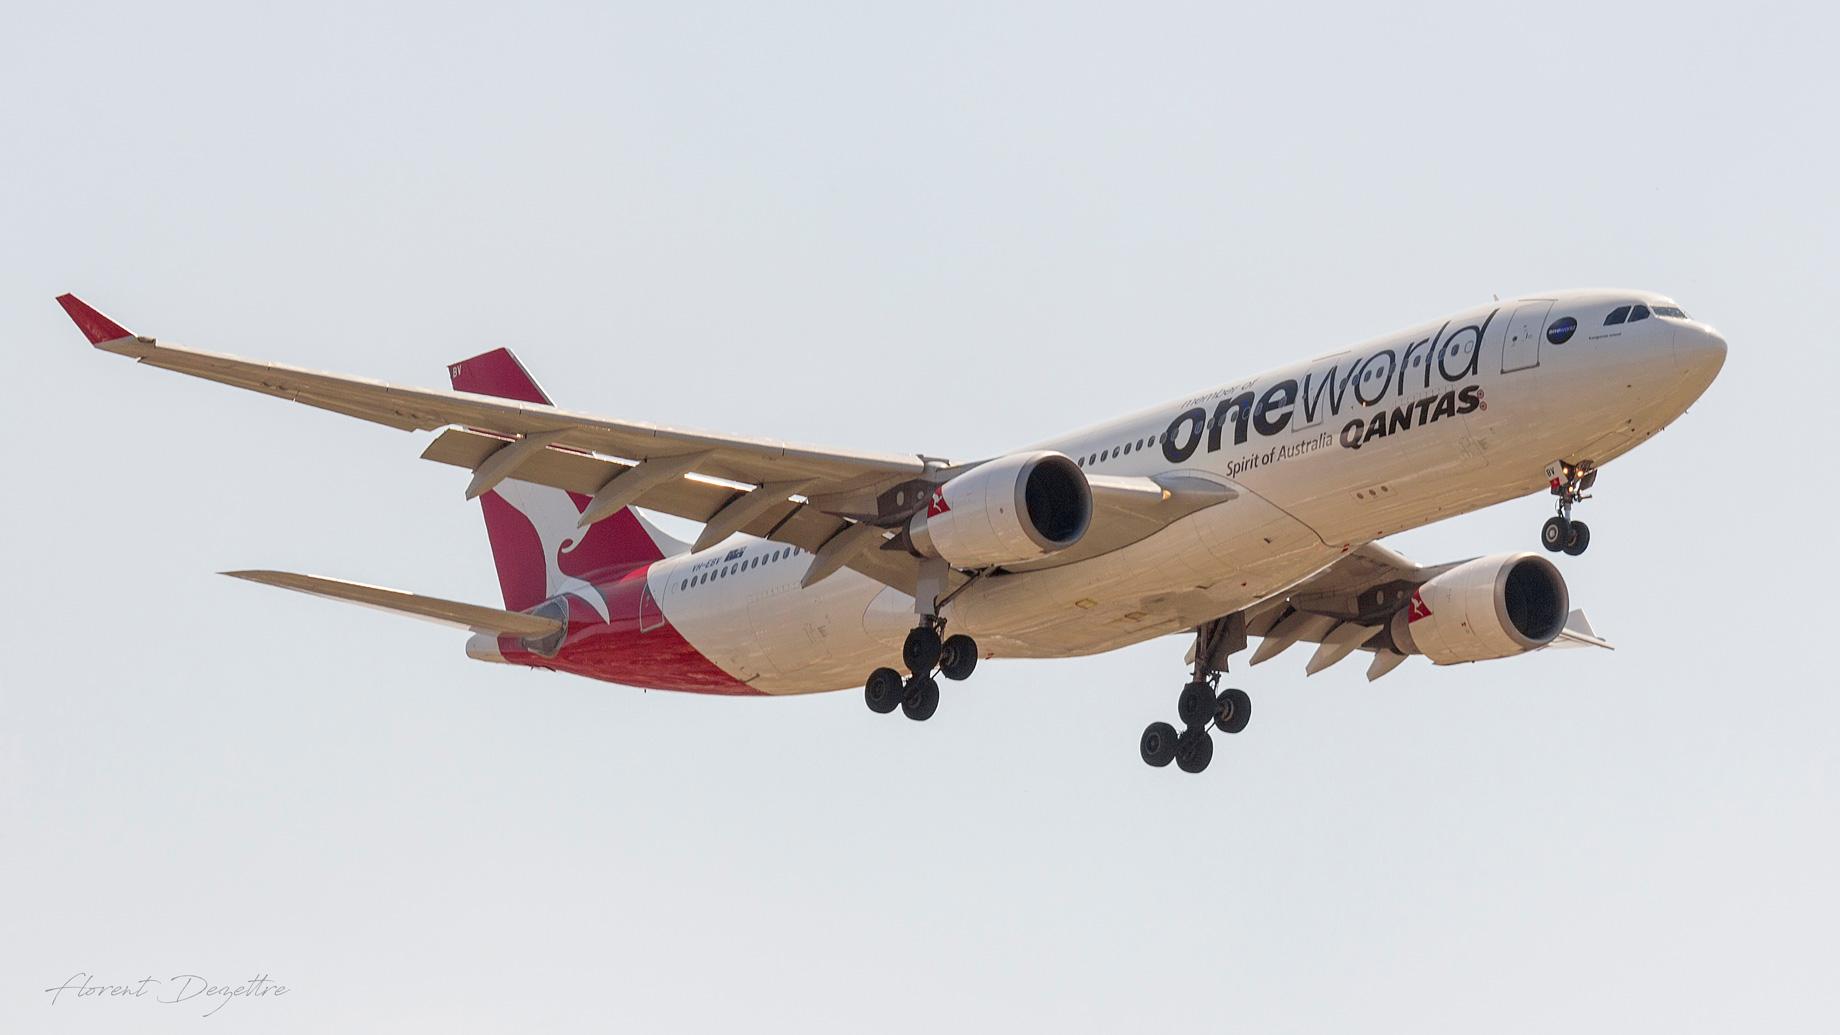 Onworld-Qantas-A330